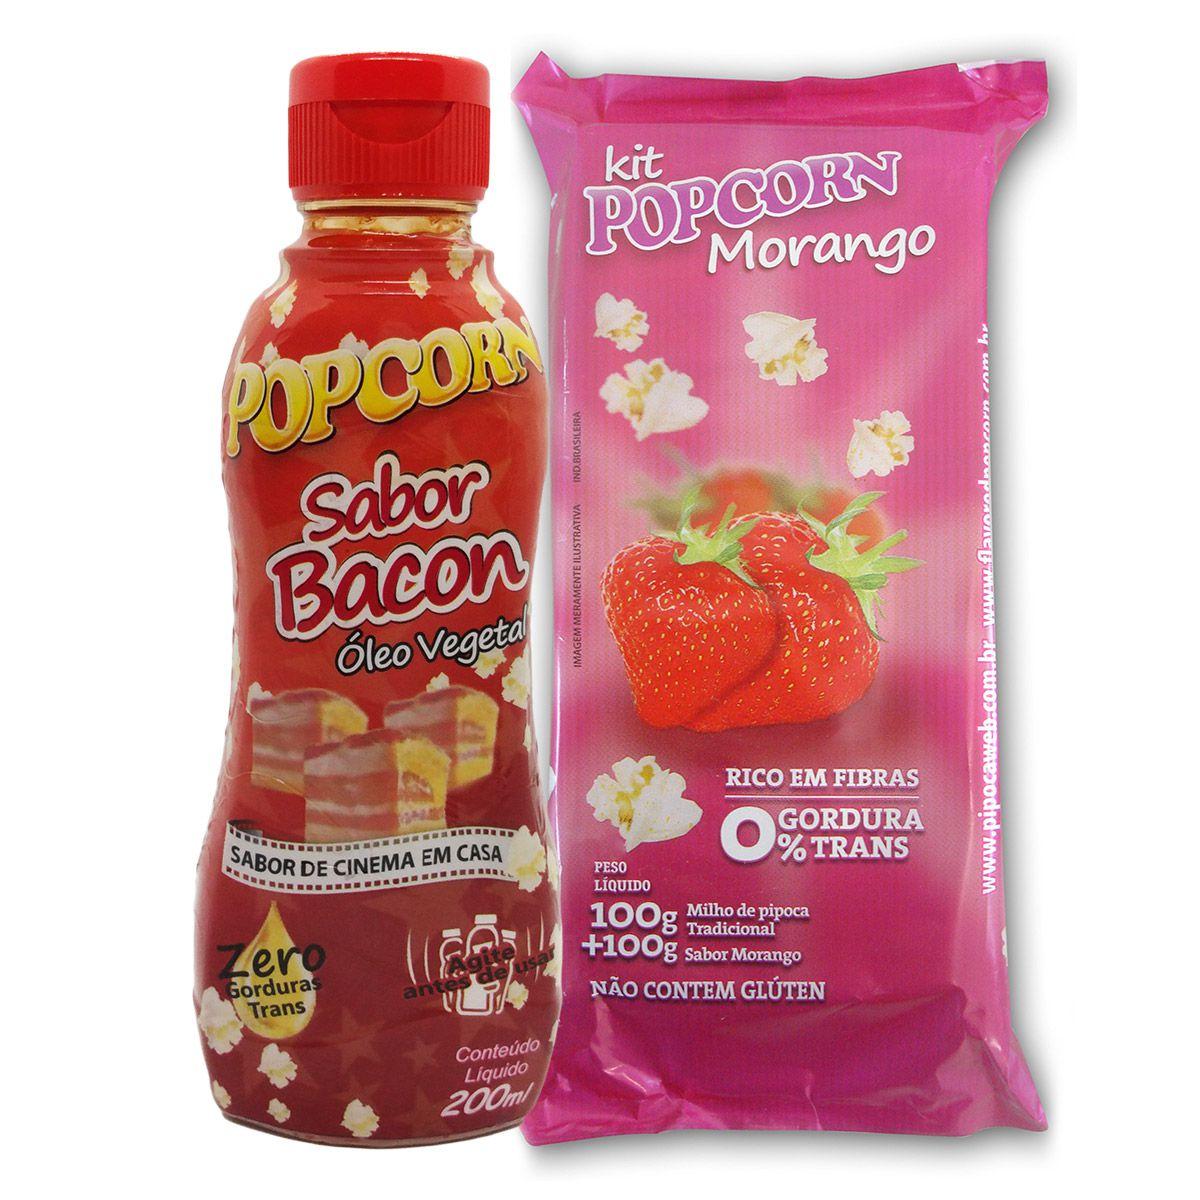 Pipoca Tradicional + Sabor Morango + Óleo Vegetal sabor bacon